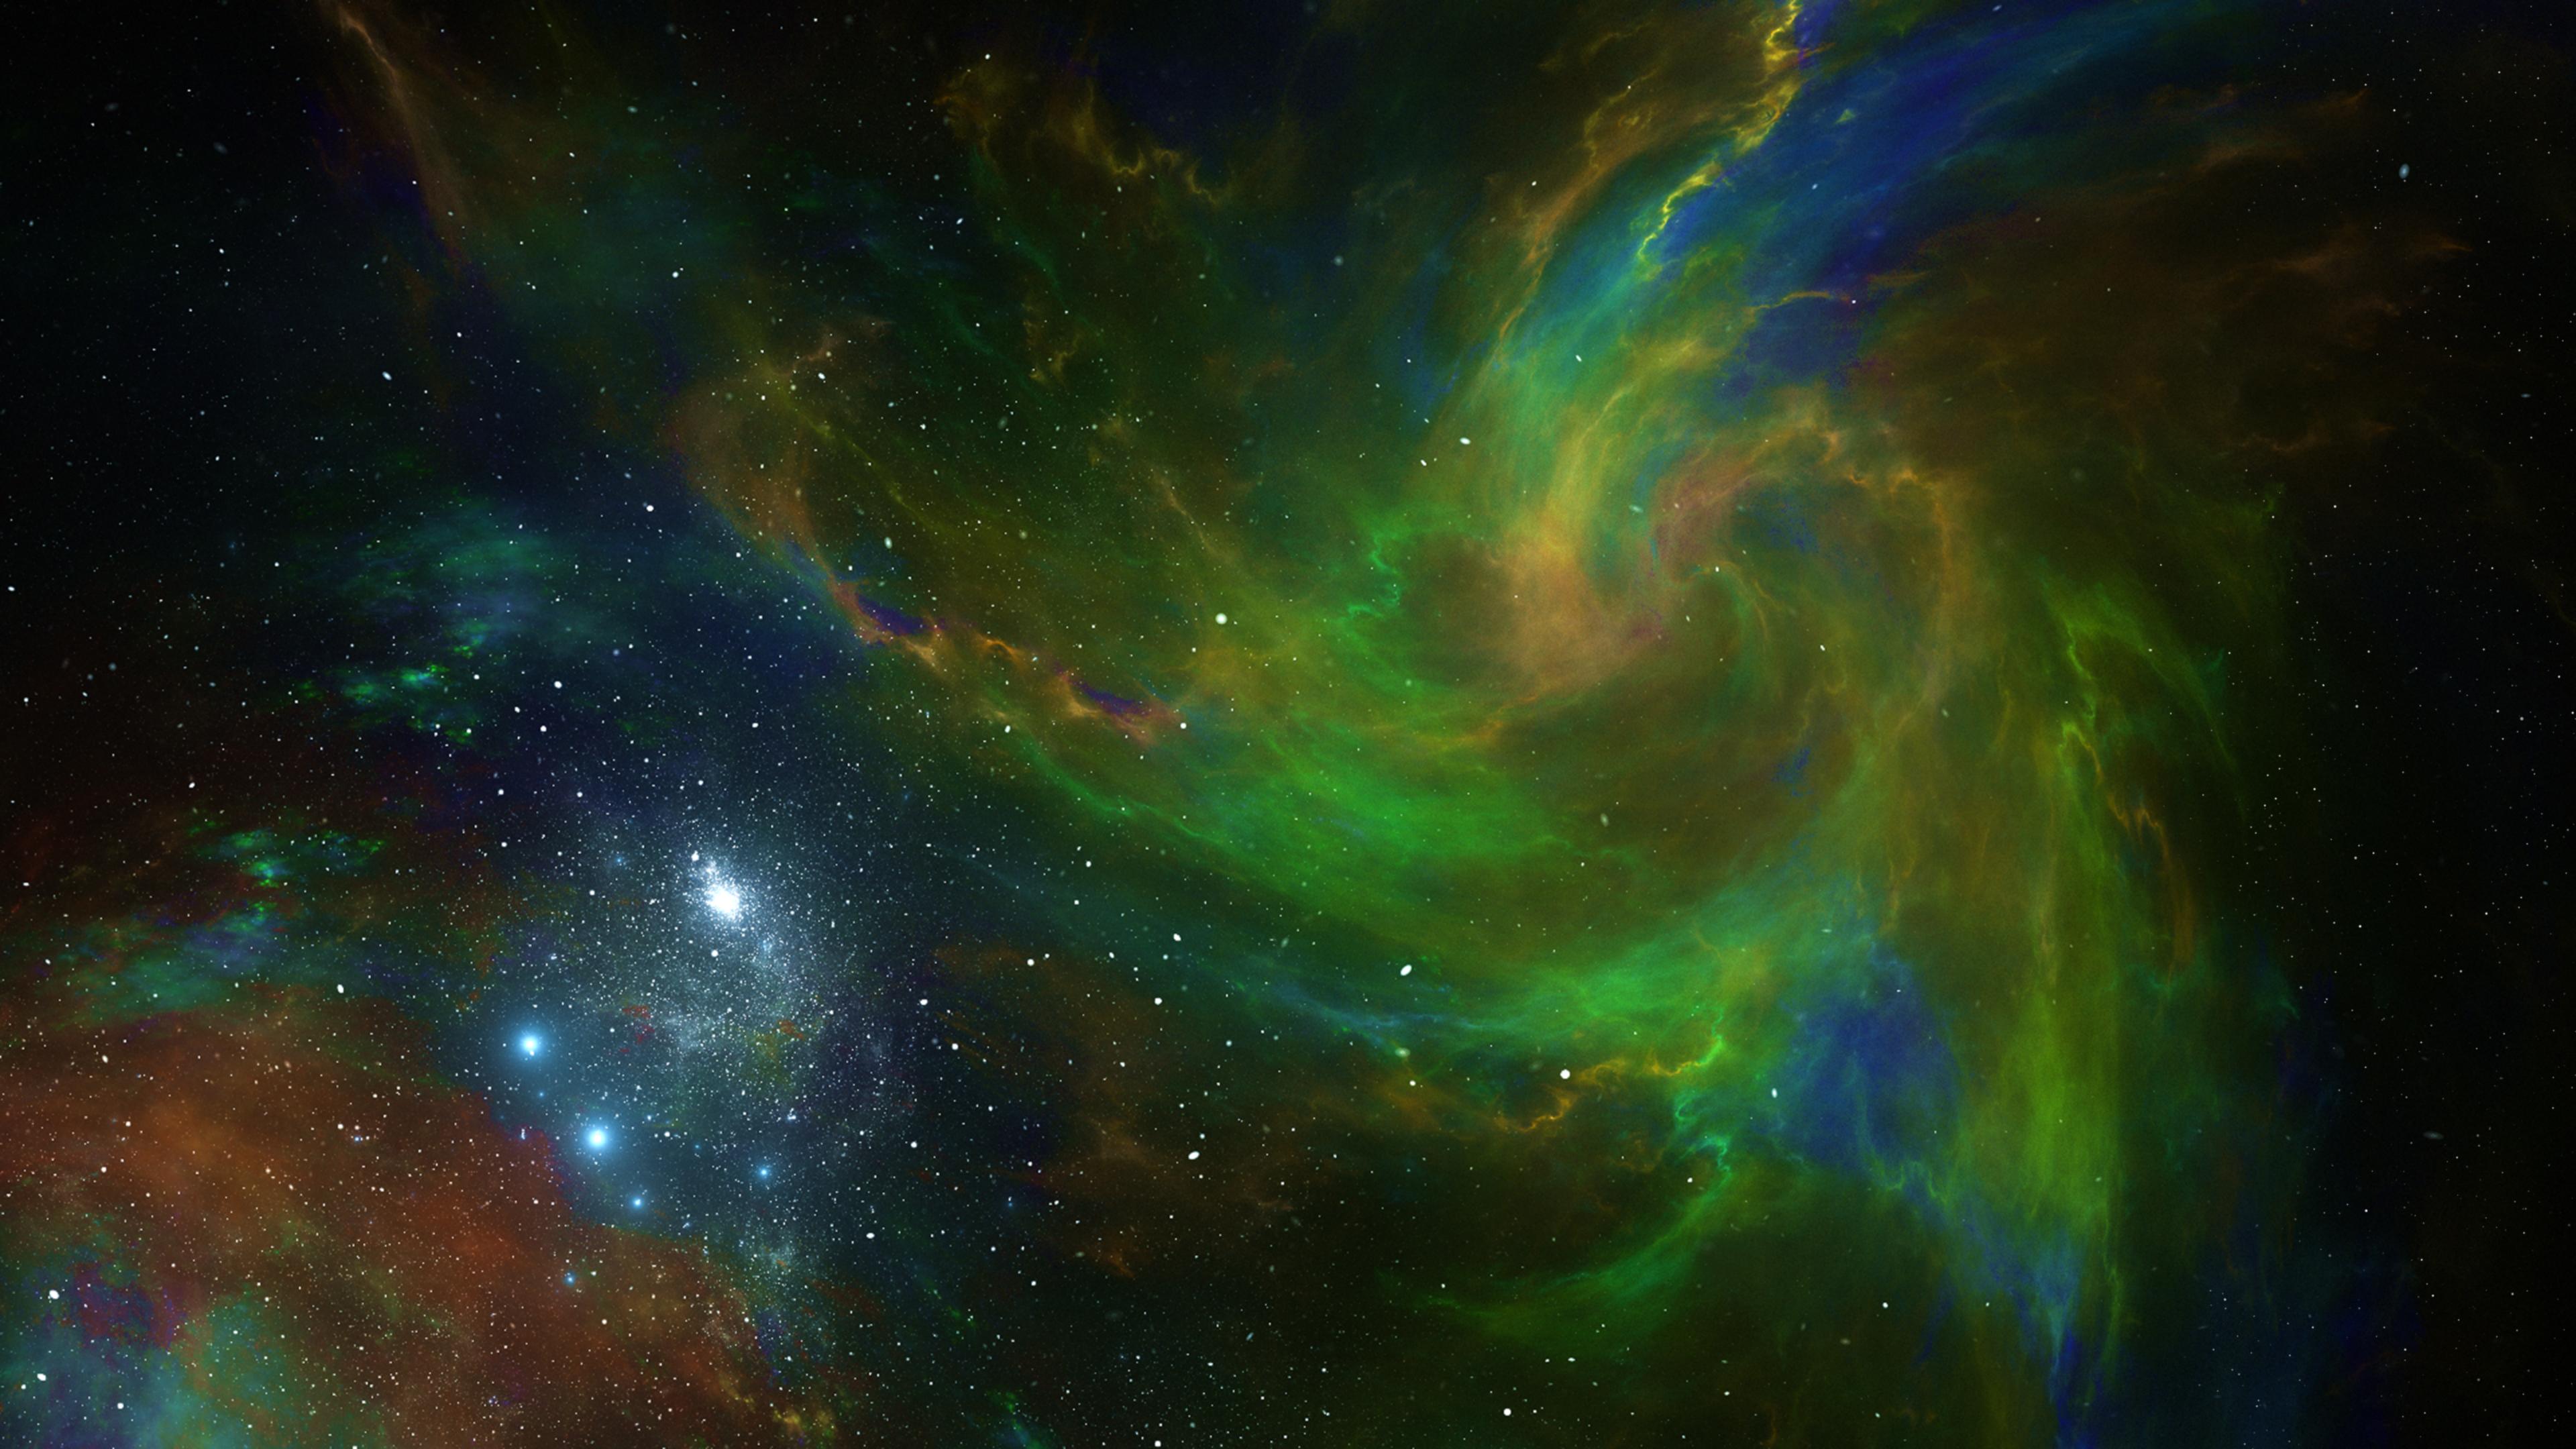 Space Nebula Currents 4k, HD Digital Universe, 4k ...